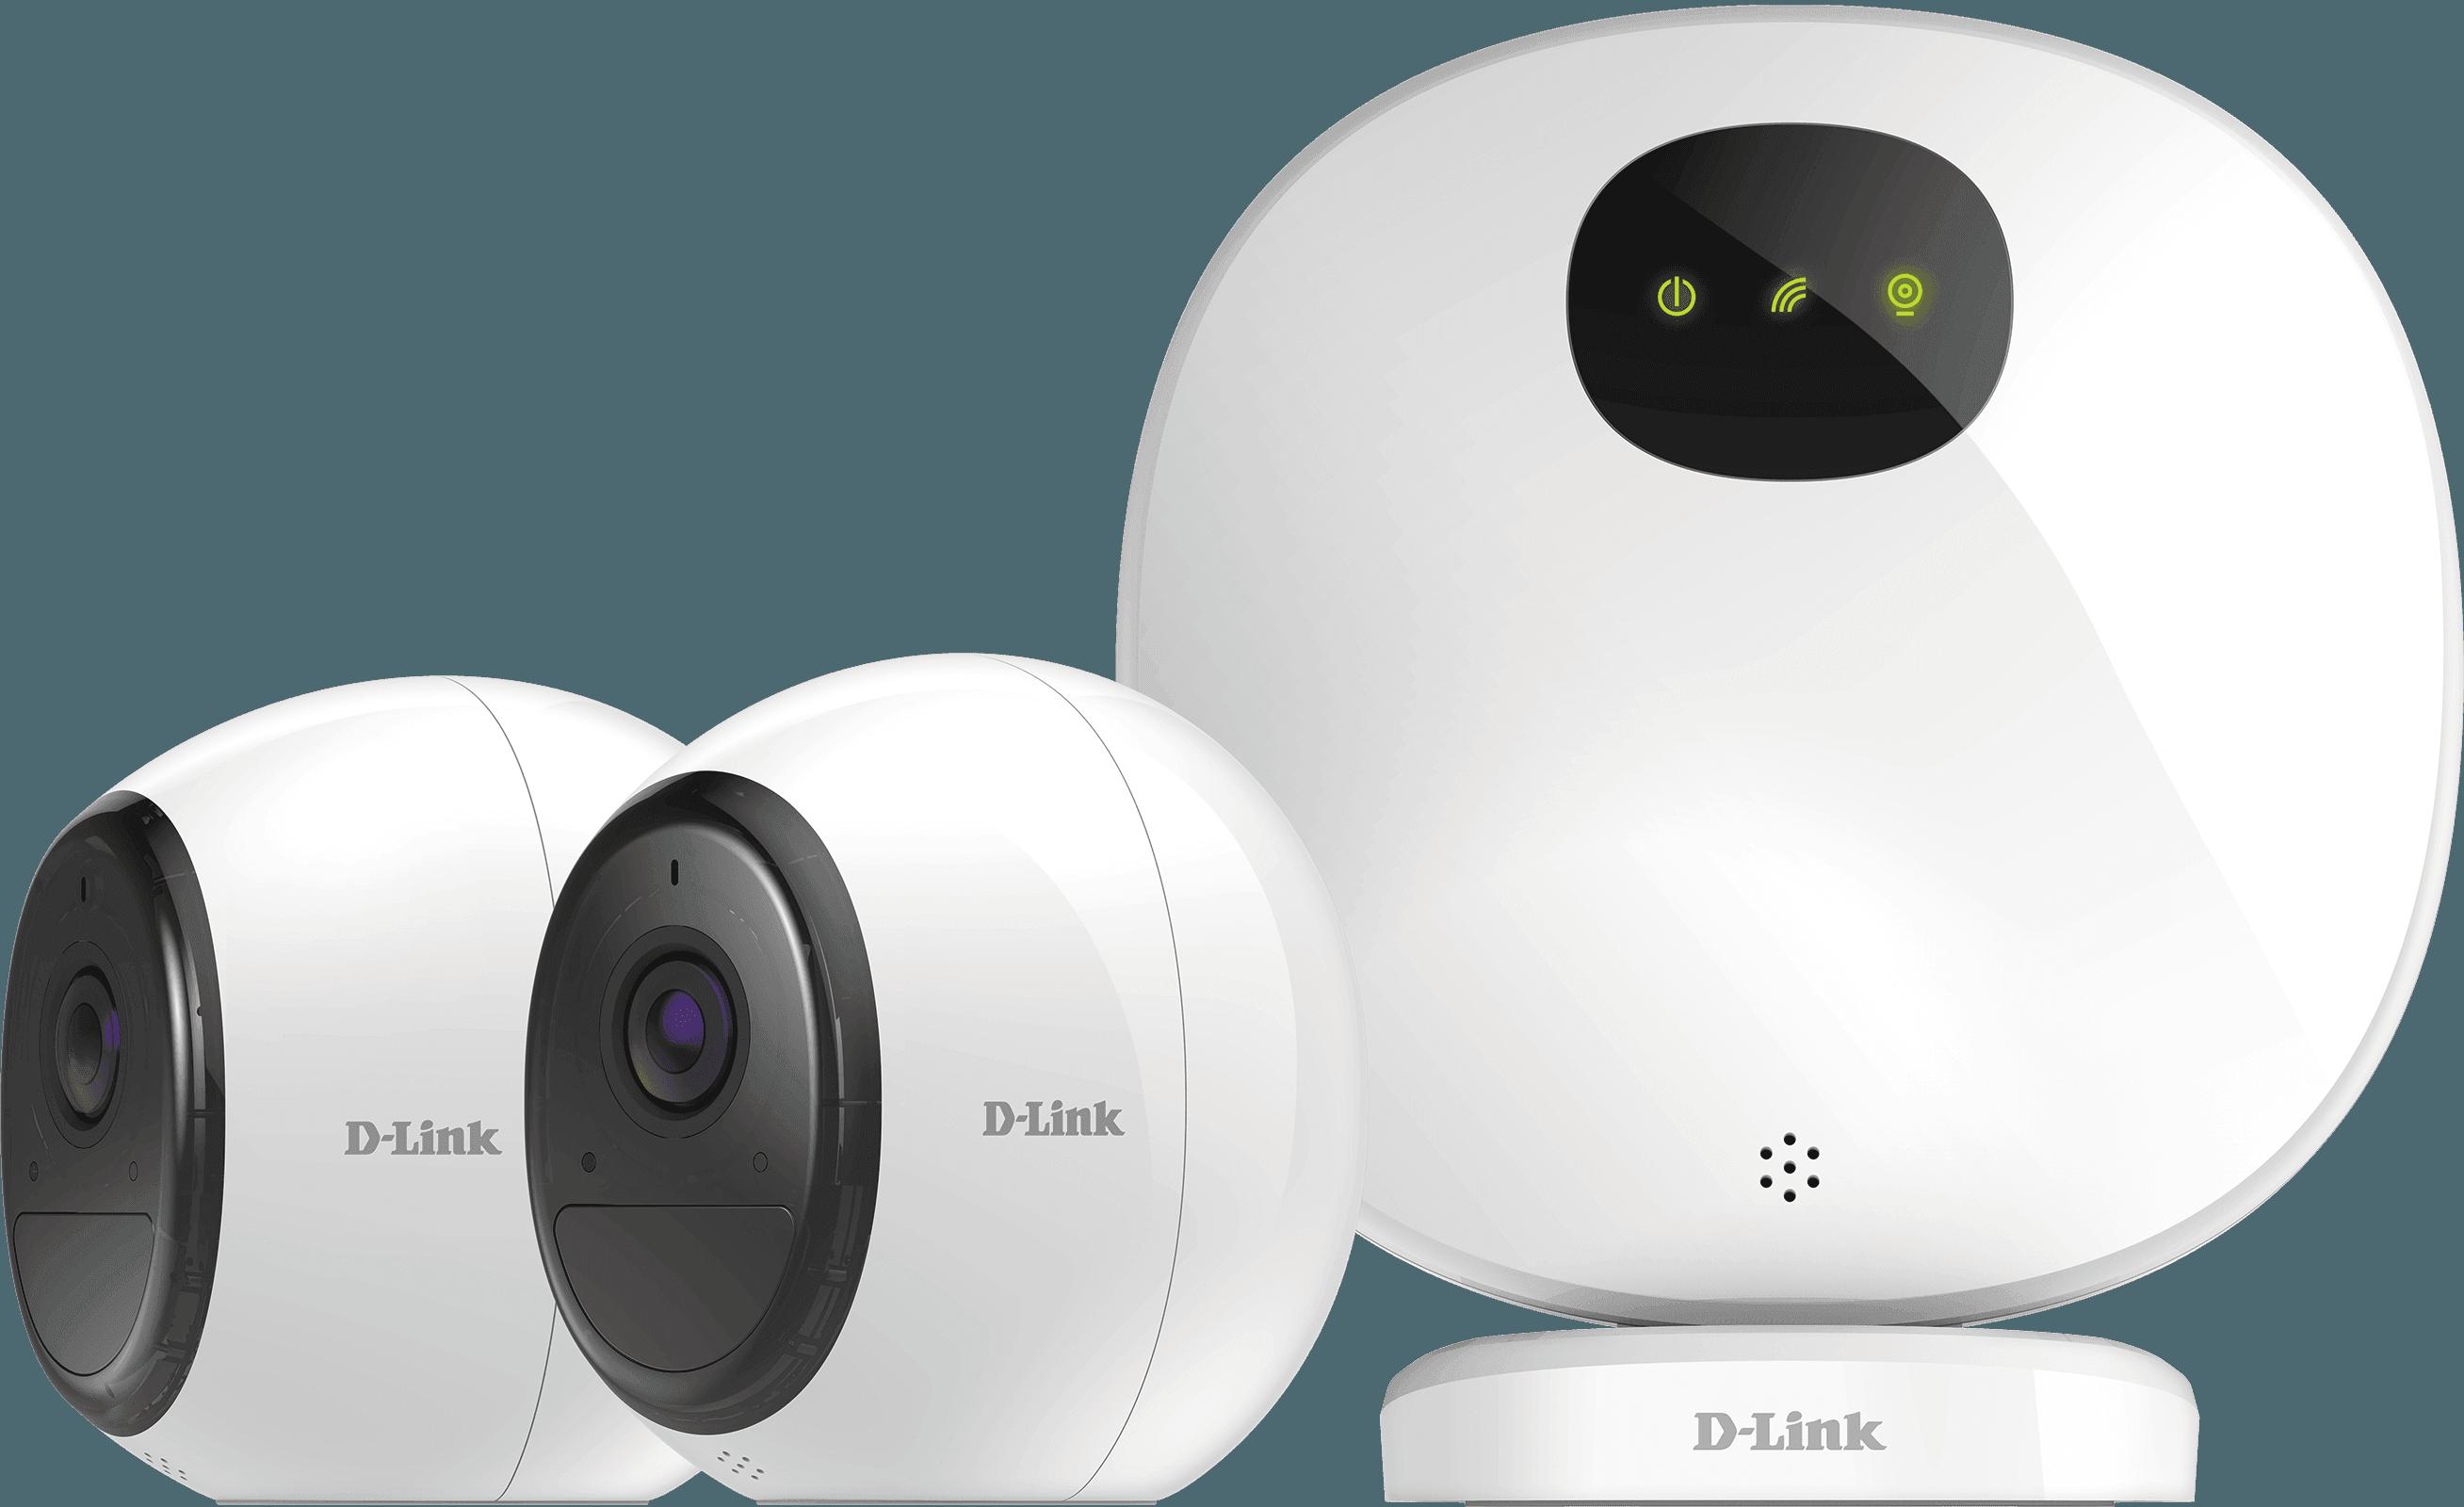 mydlink Pro Wire‑Free Camera Kit (D-LINK DCS-2802KT-EU) Test 22 techboys.de • smarte News, auf den Punkt! mydlink Pro Wire‑Free Camera Kit (D-LINK DCS-2802KT-EU) Test